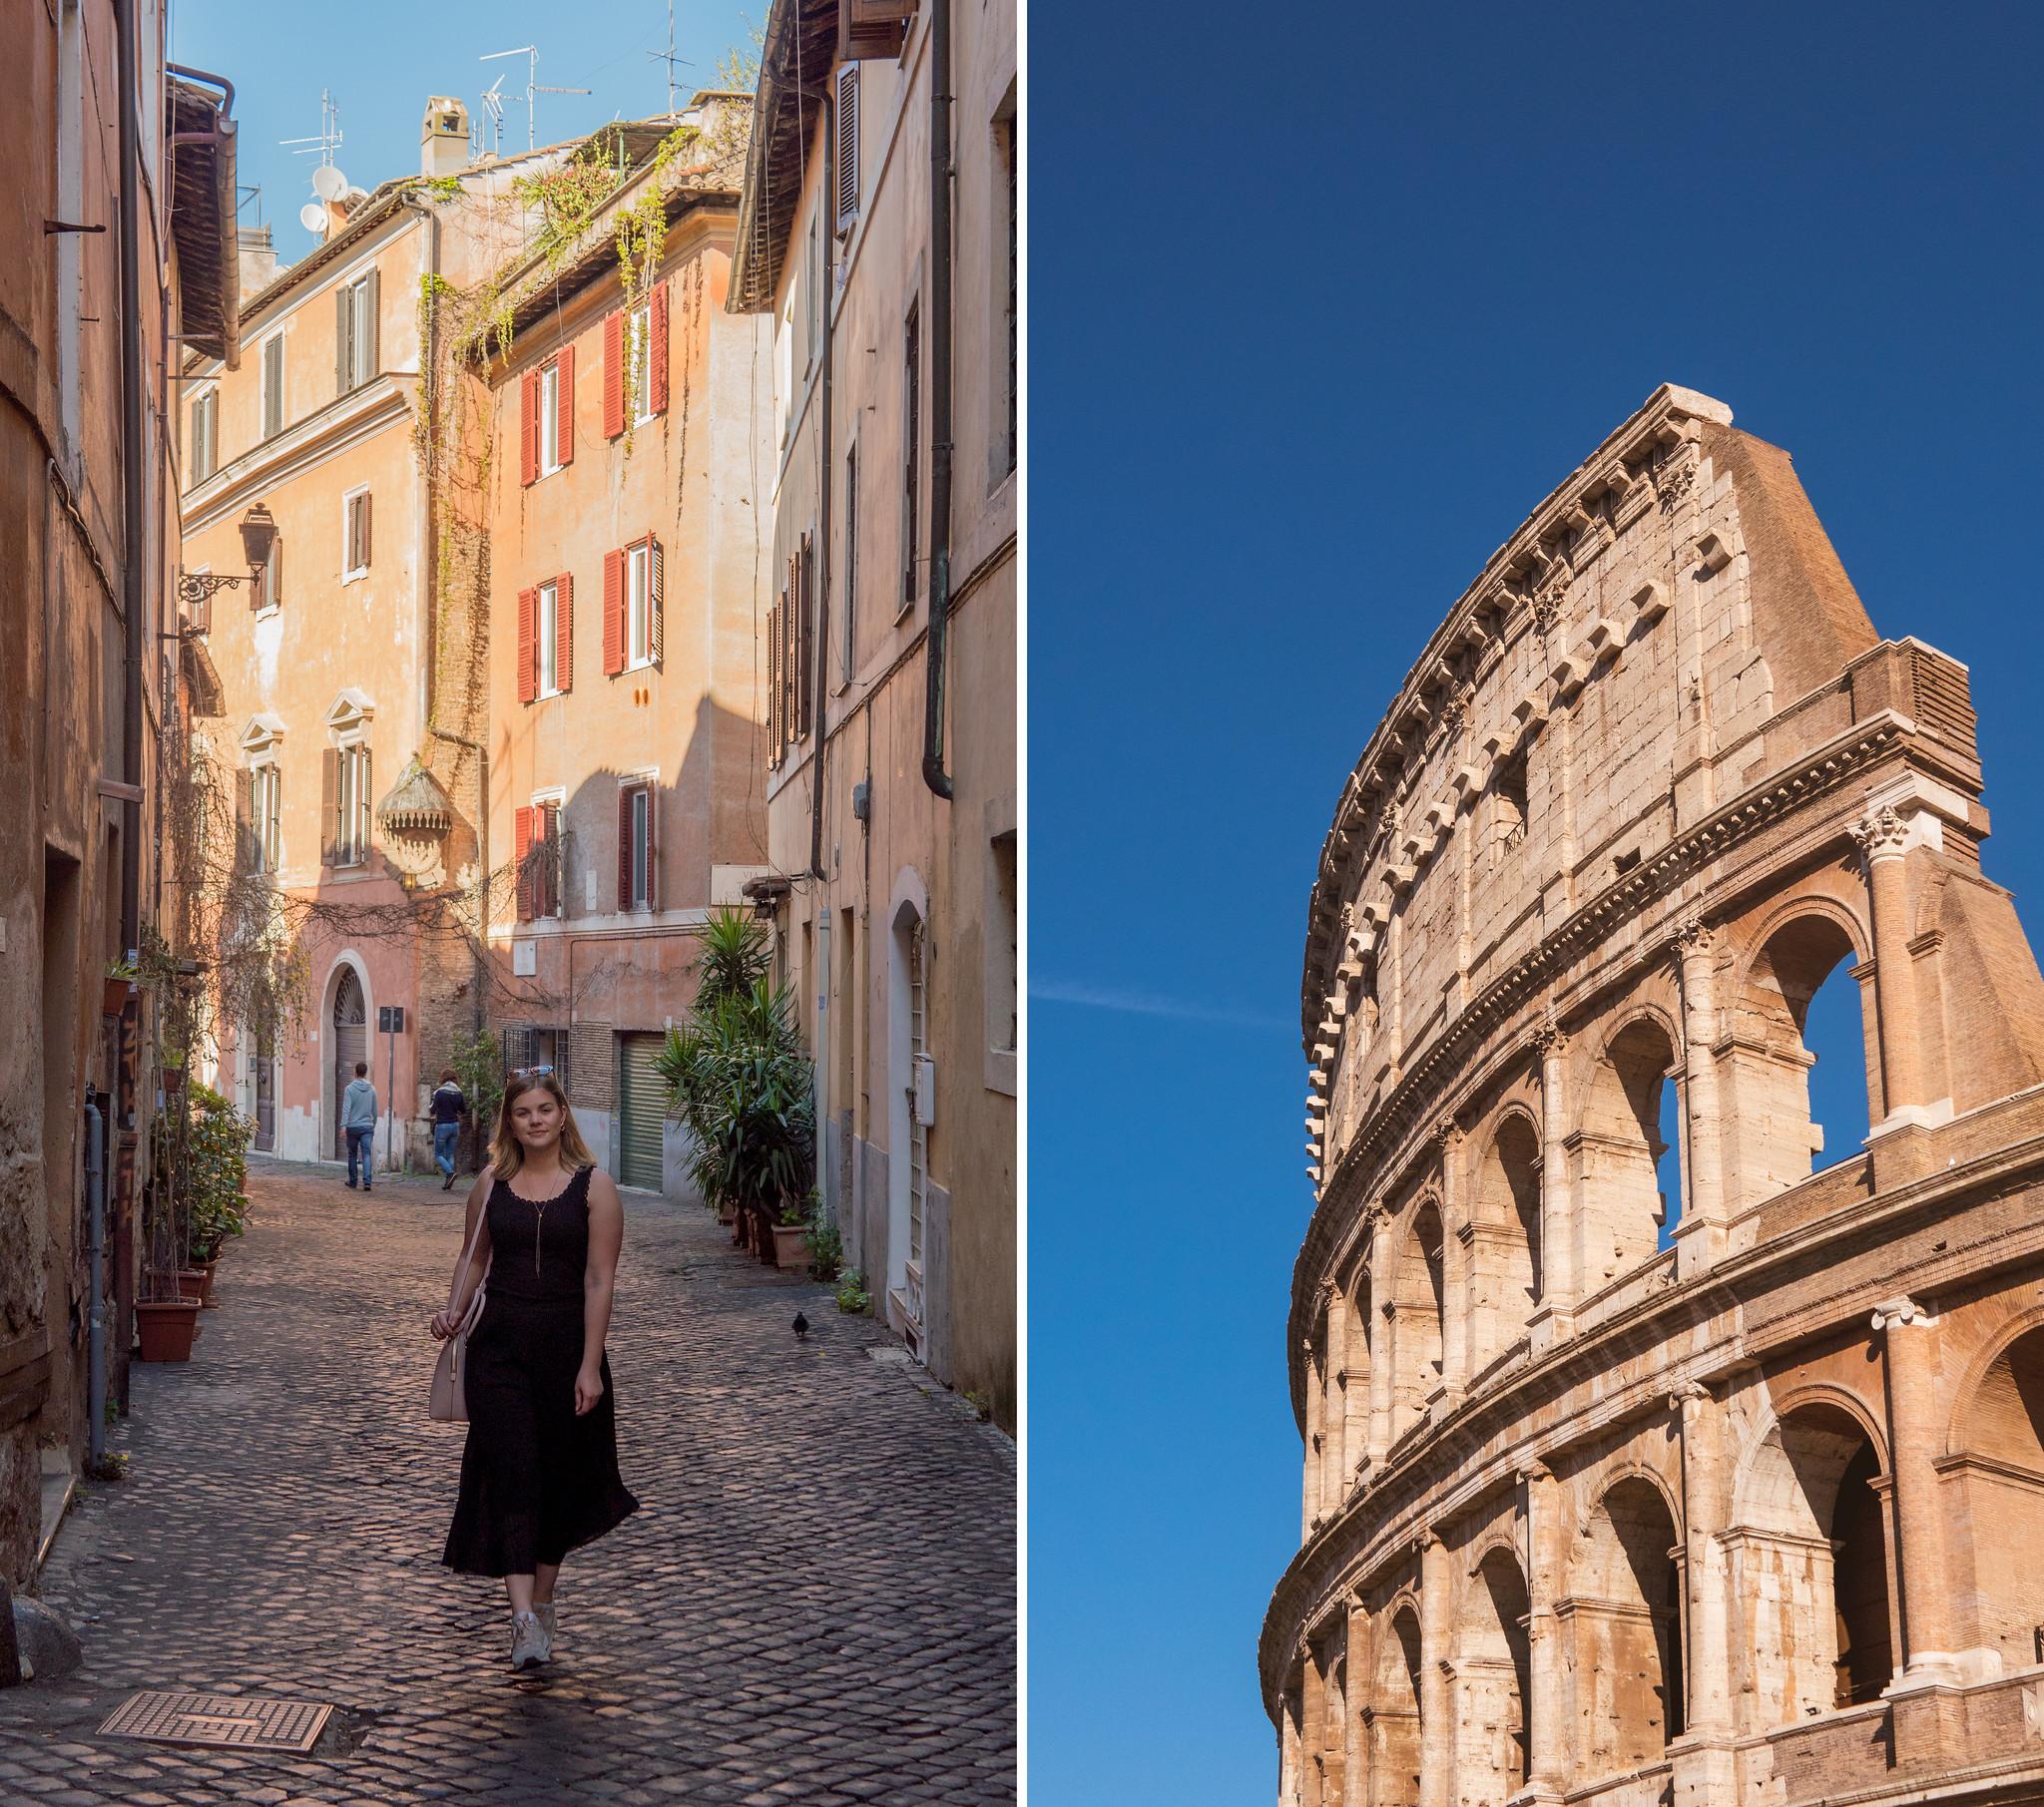 Rooma nahtavyydet